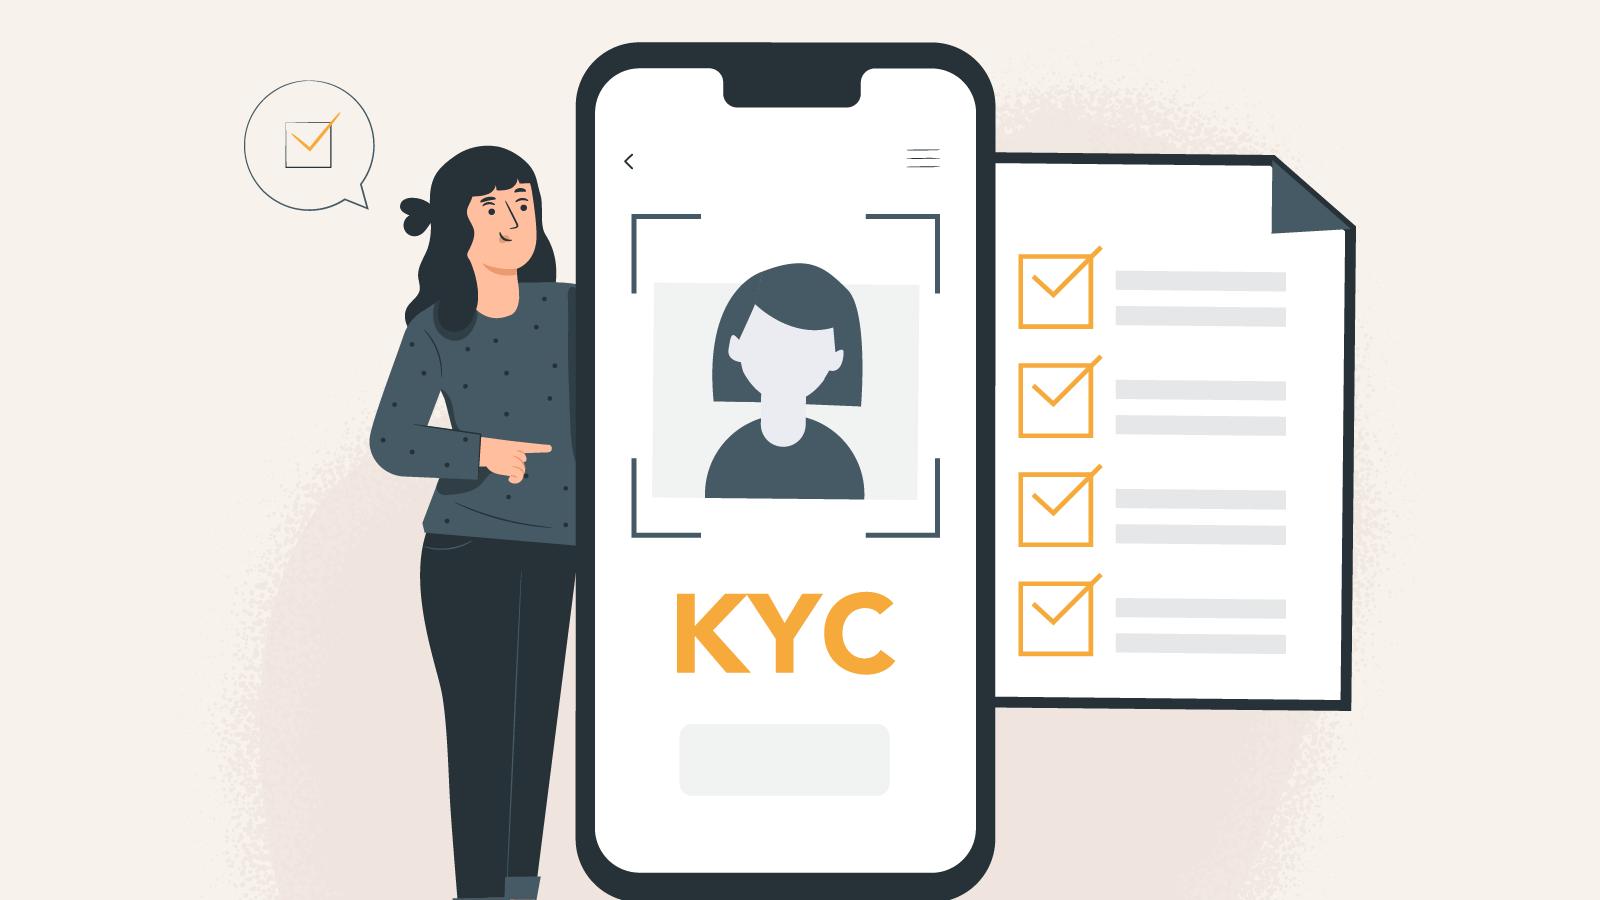 Complete the KYC procedure